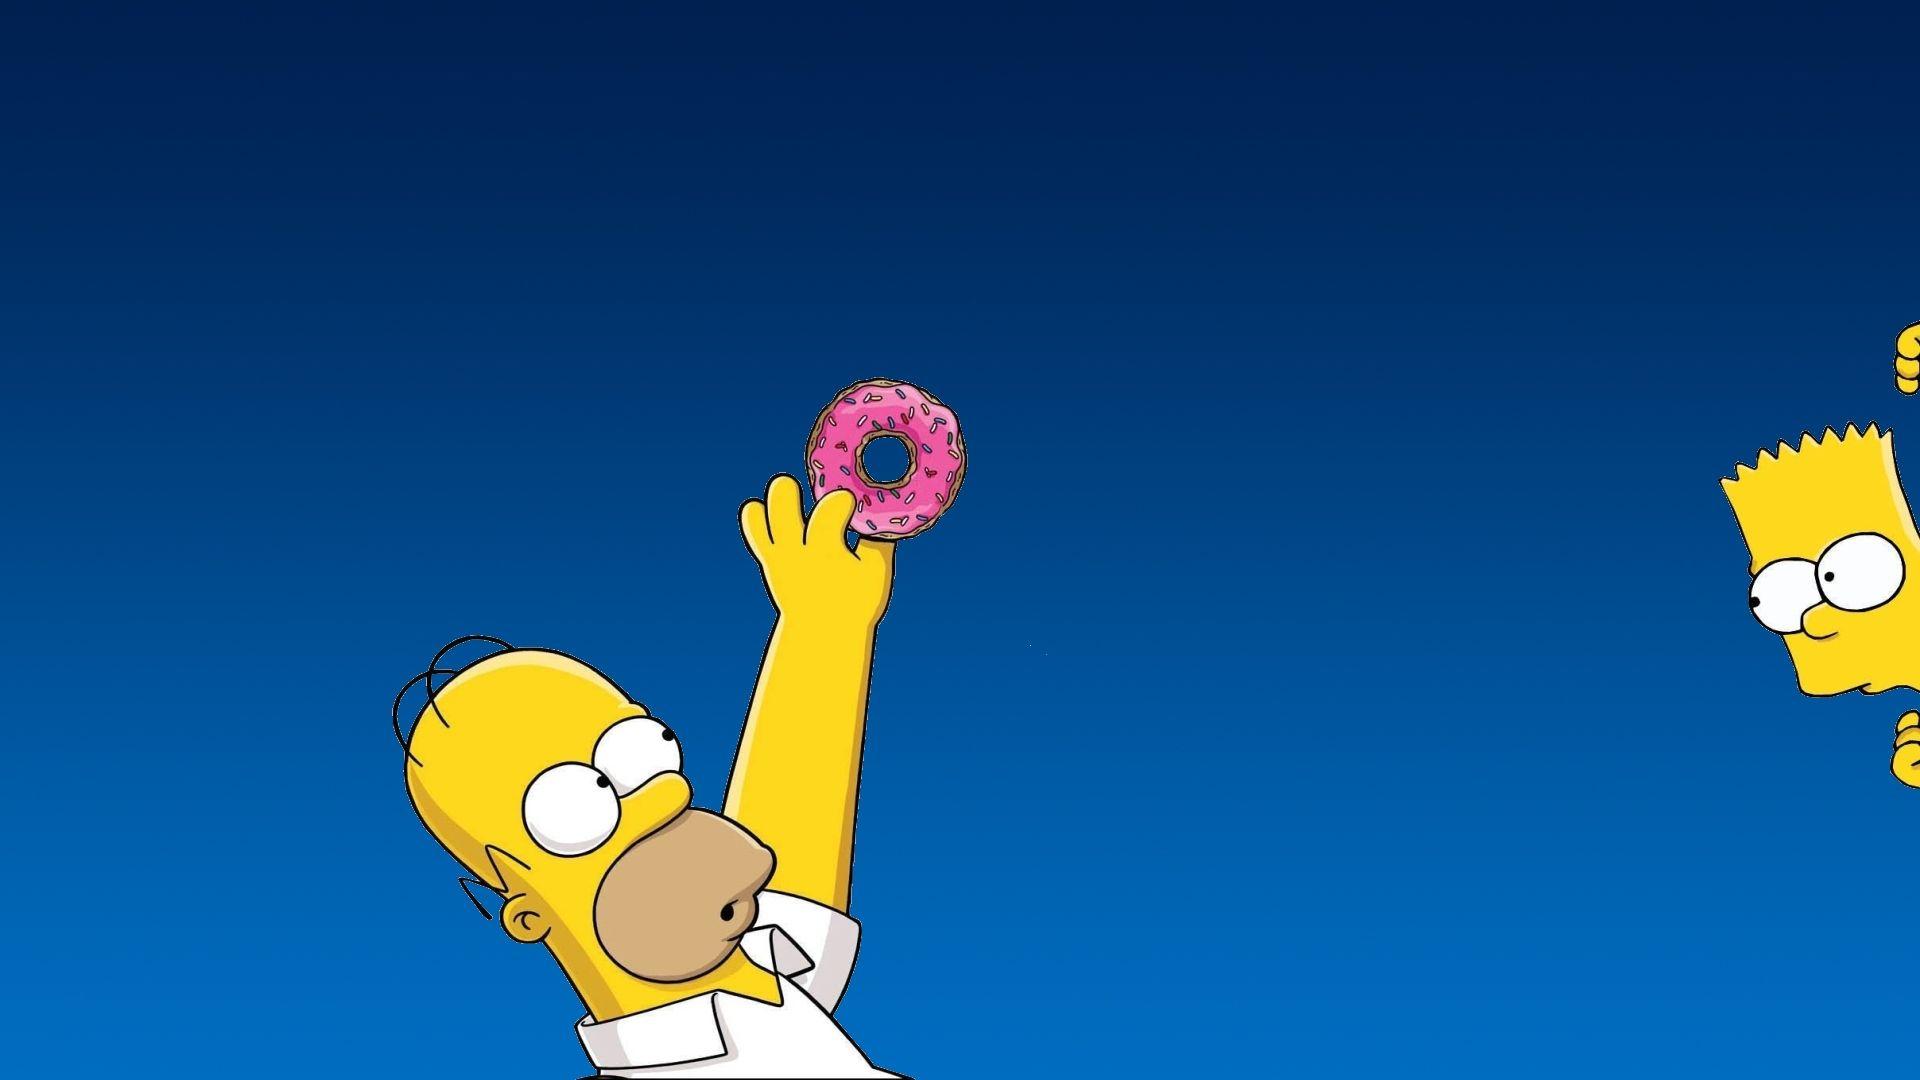 Homer and Bart Simpson Windows 10 Wallpaper ицо